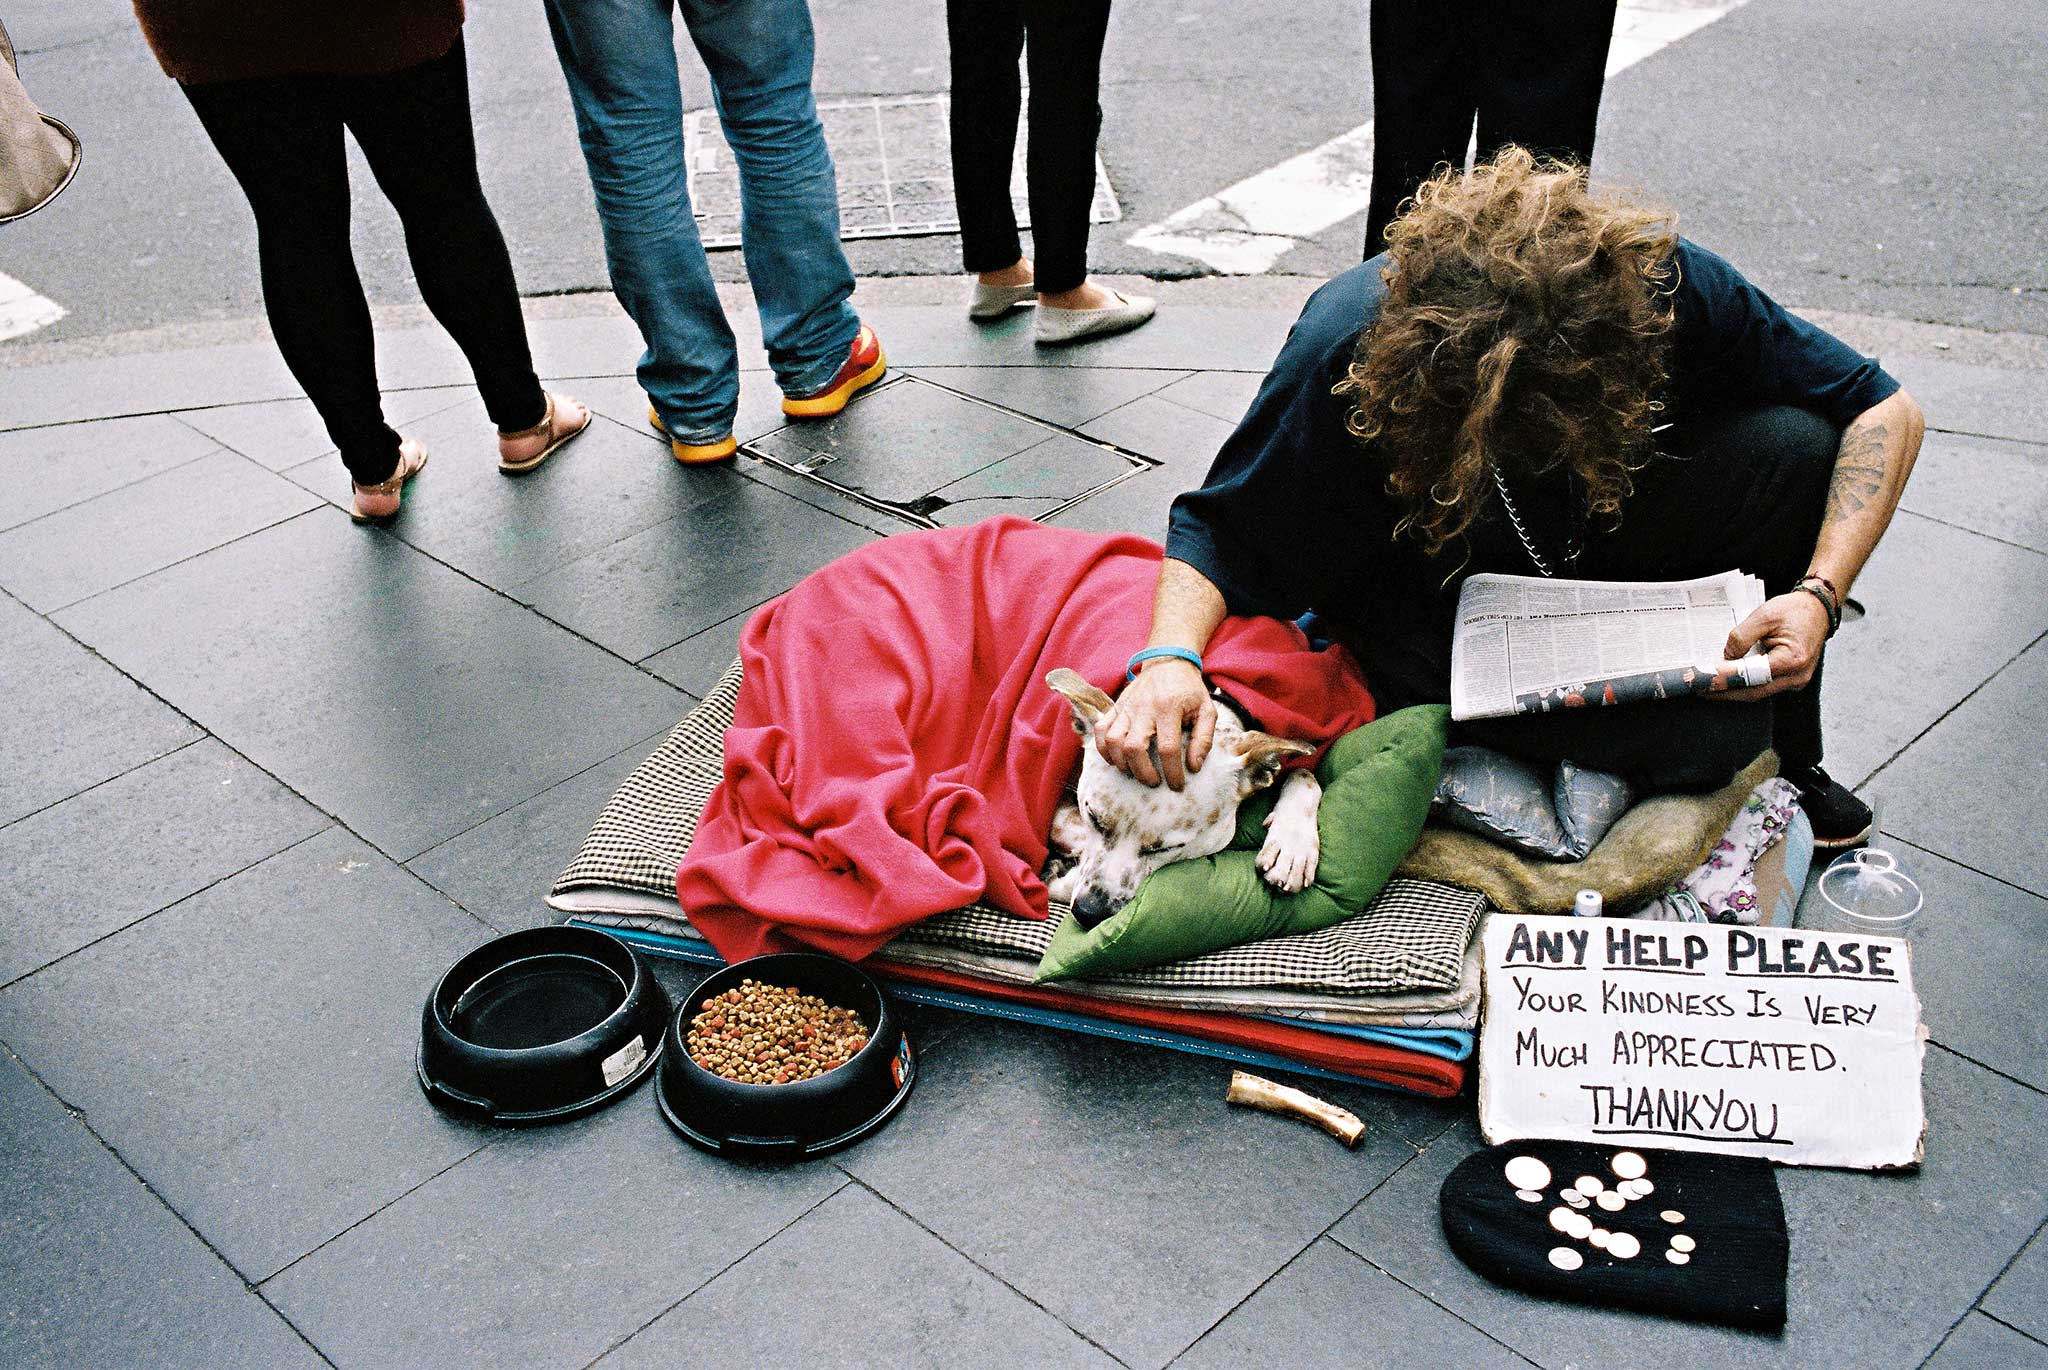 homeless-sydney-intersection-dog